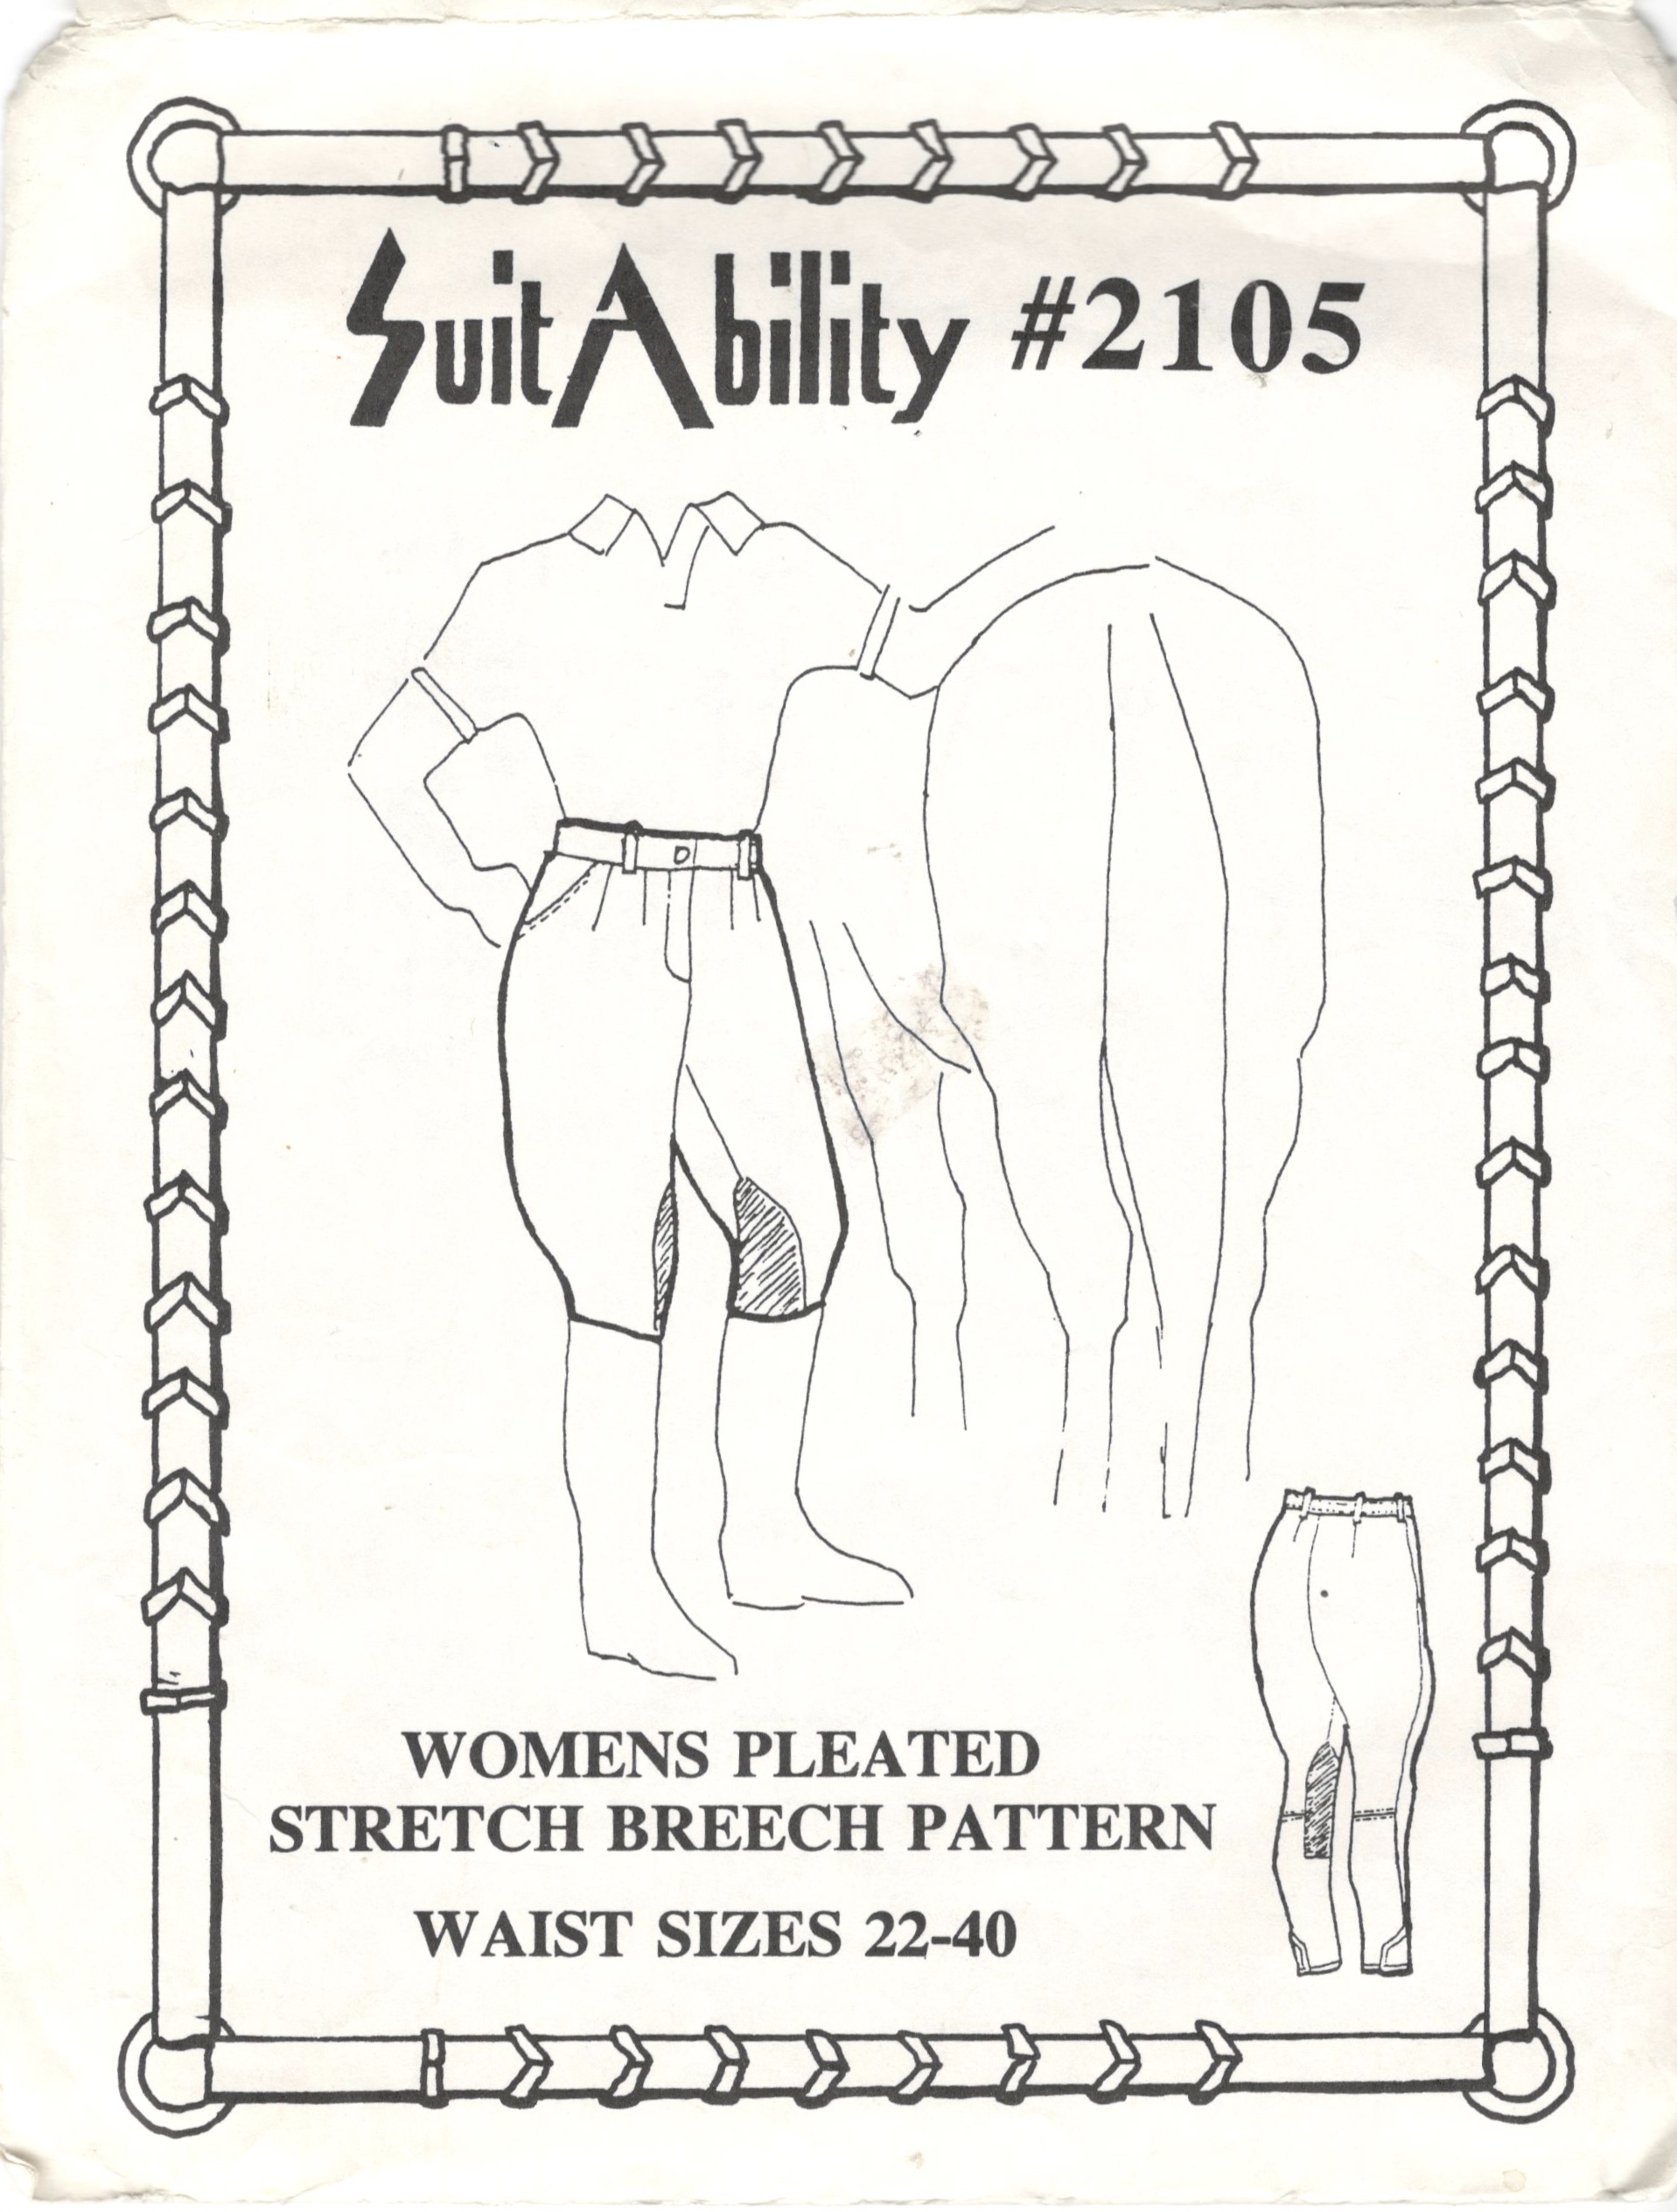 Suitability 2105